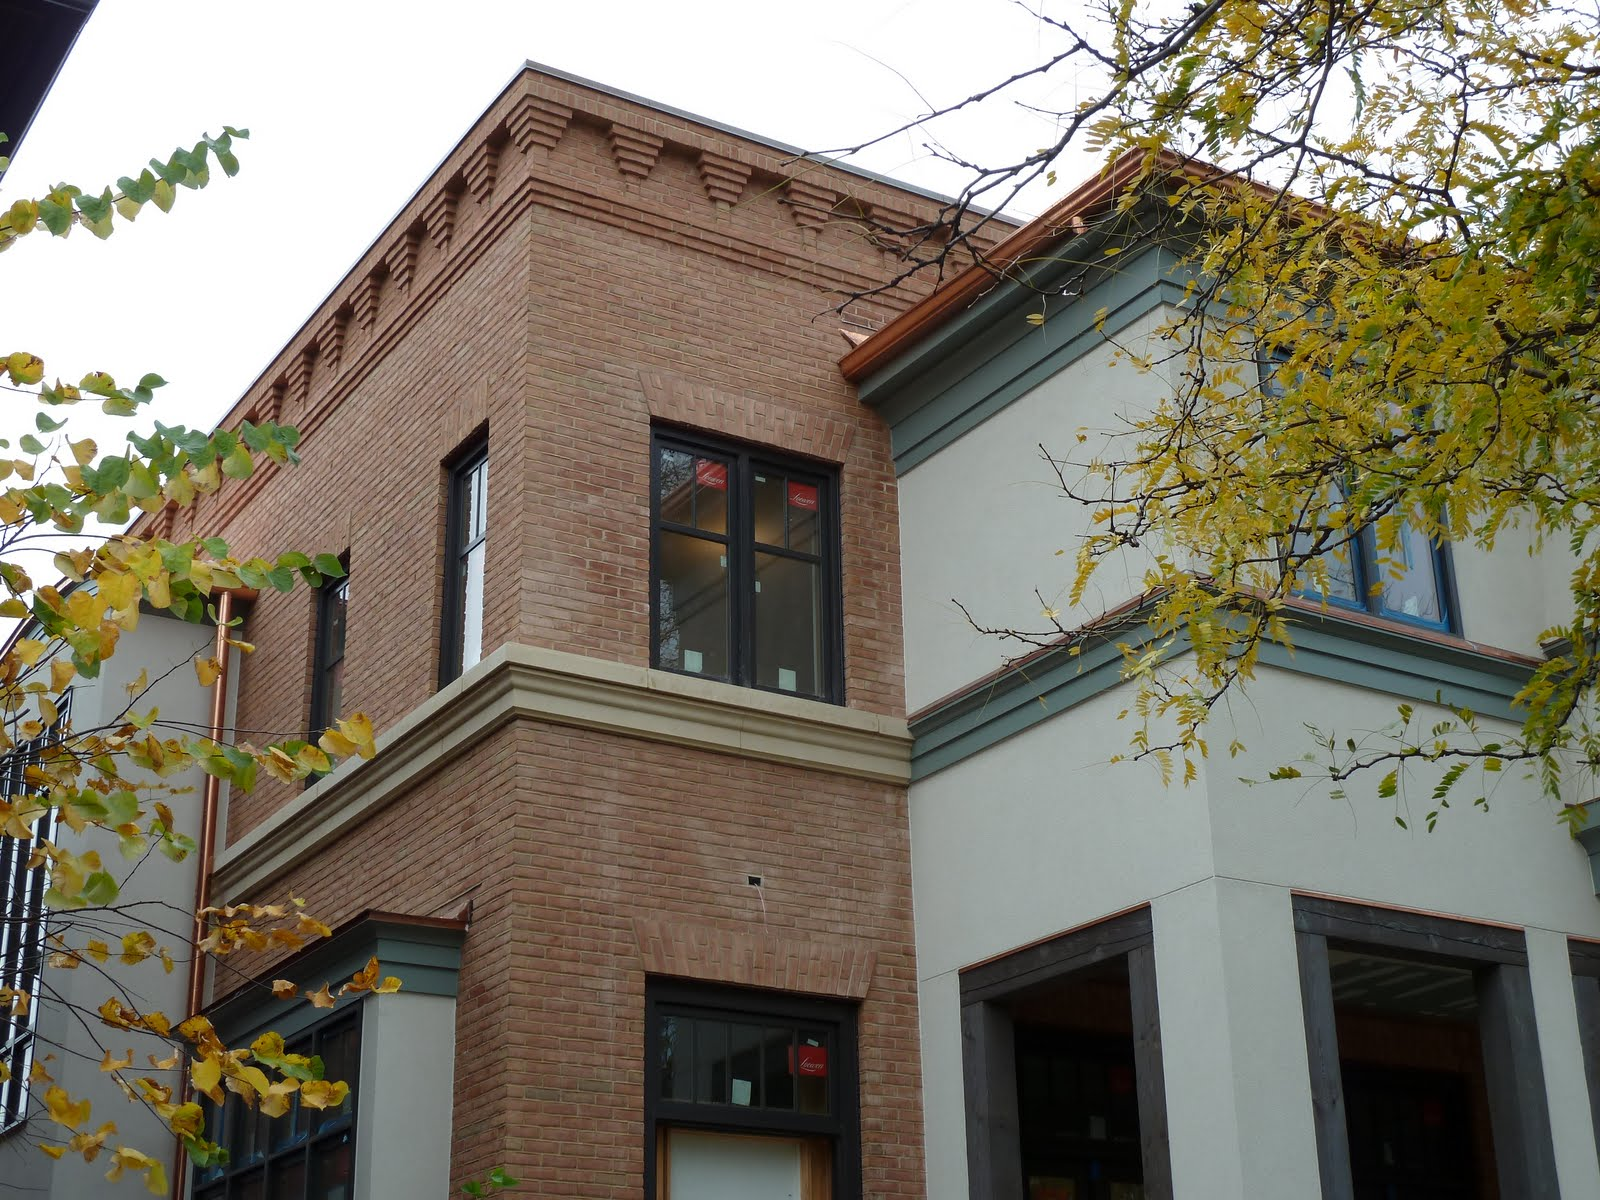 Land Contract Homes In Urbana Ohio